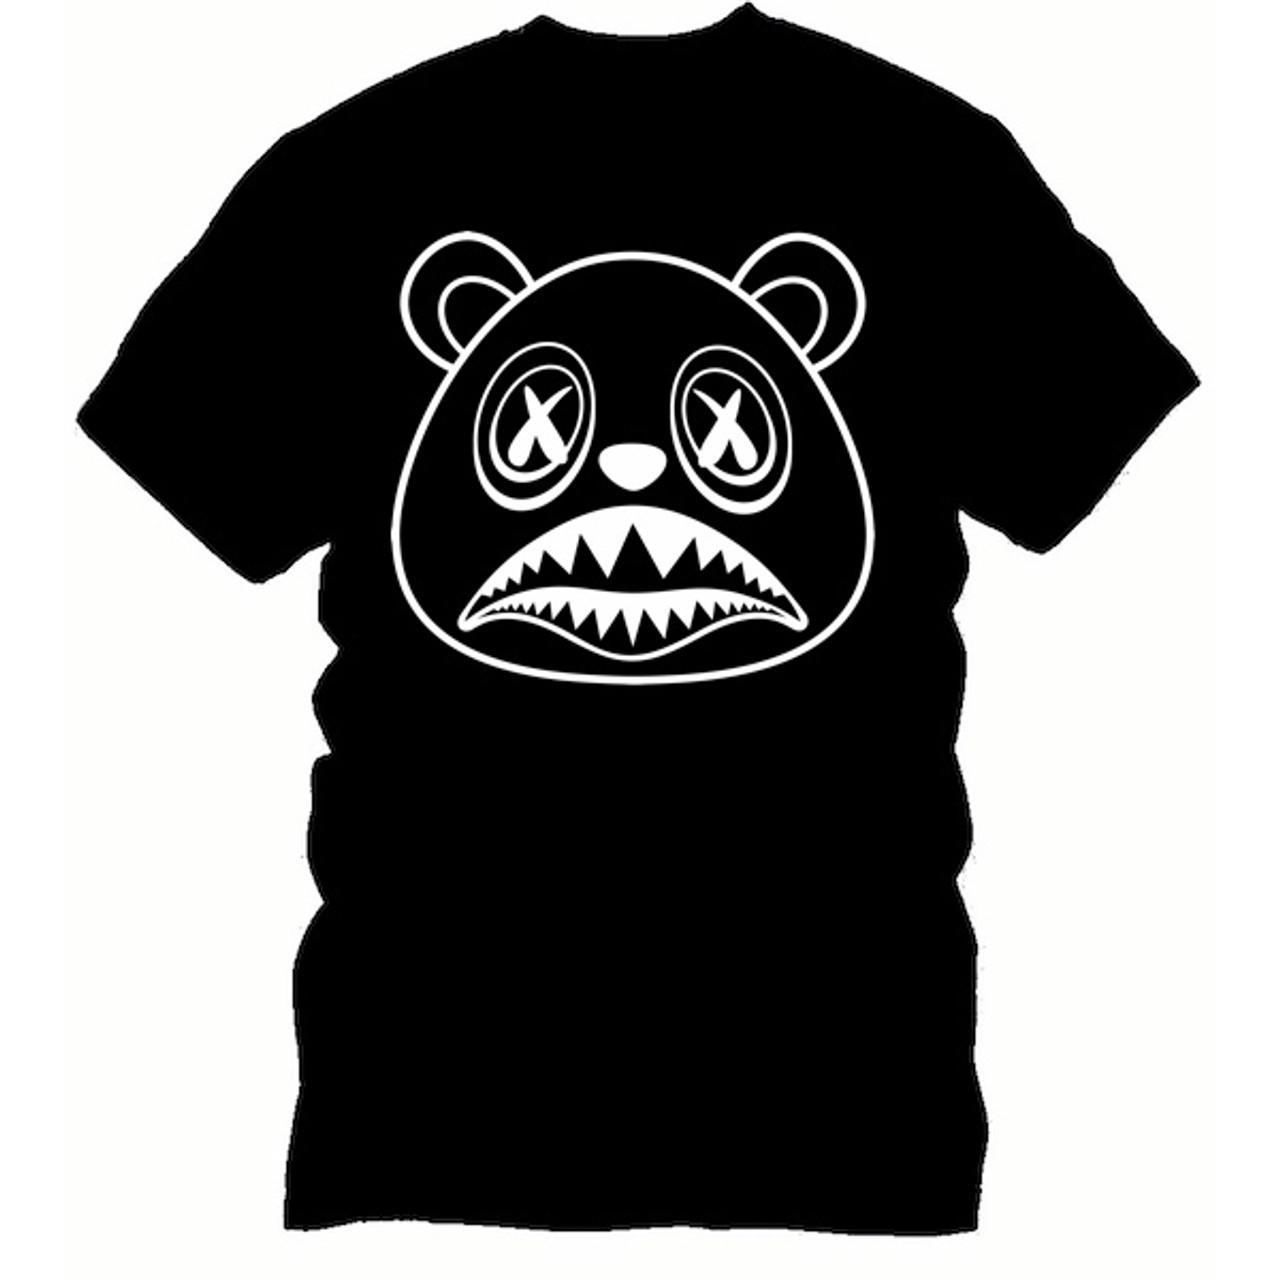 a6e7ea3b9ac Baws Bear Logo Black T-Shirt Available - This tee is a NZ Exclusive ...